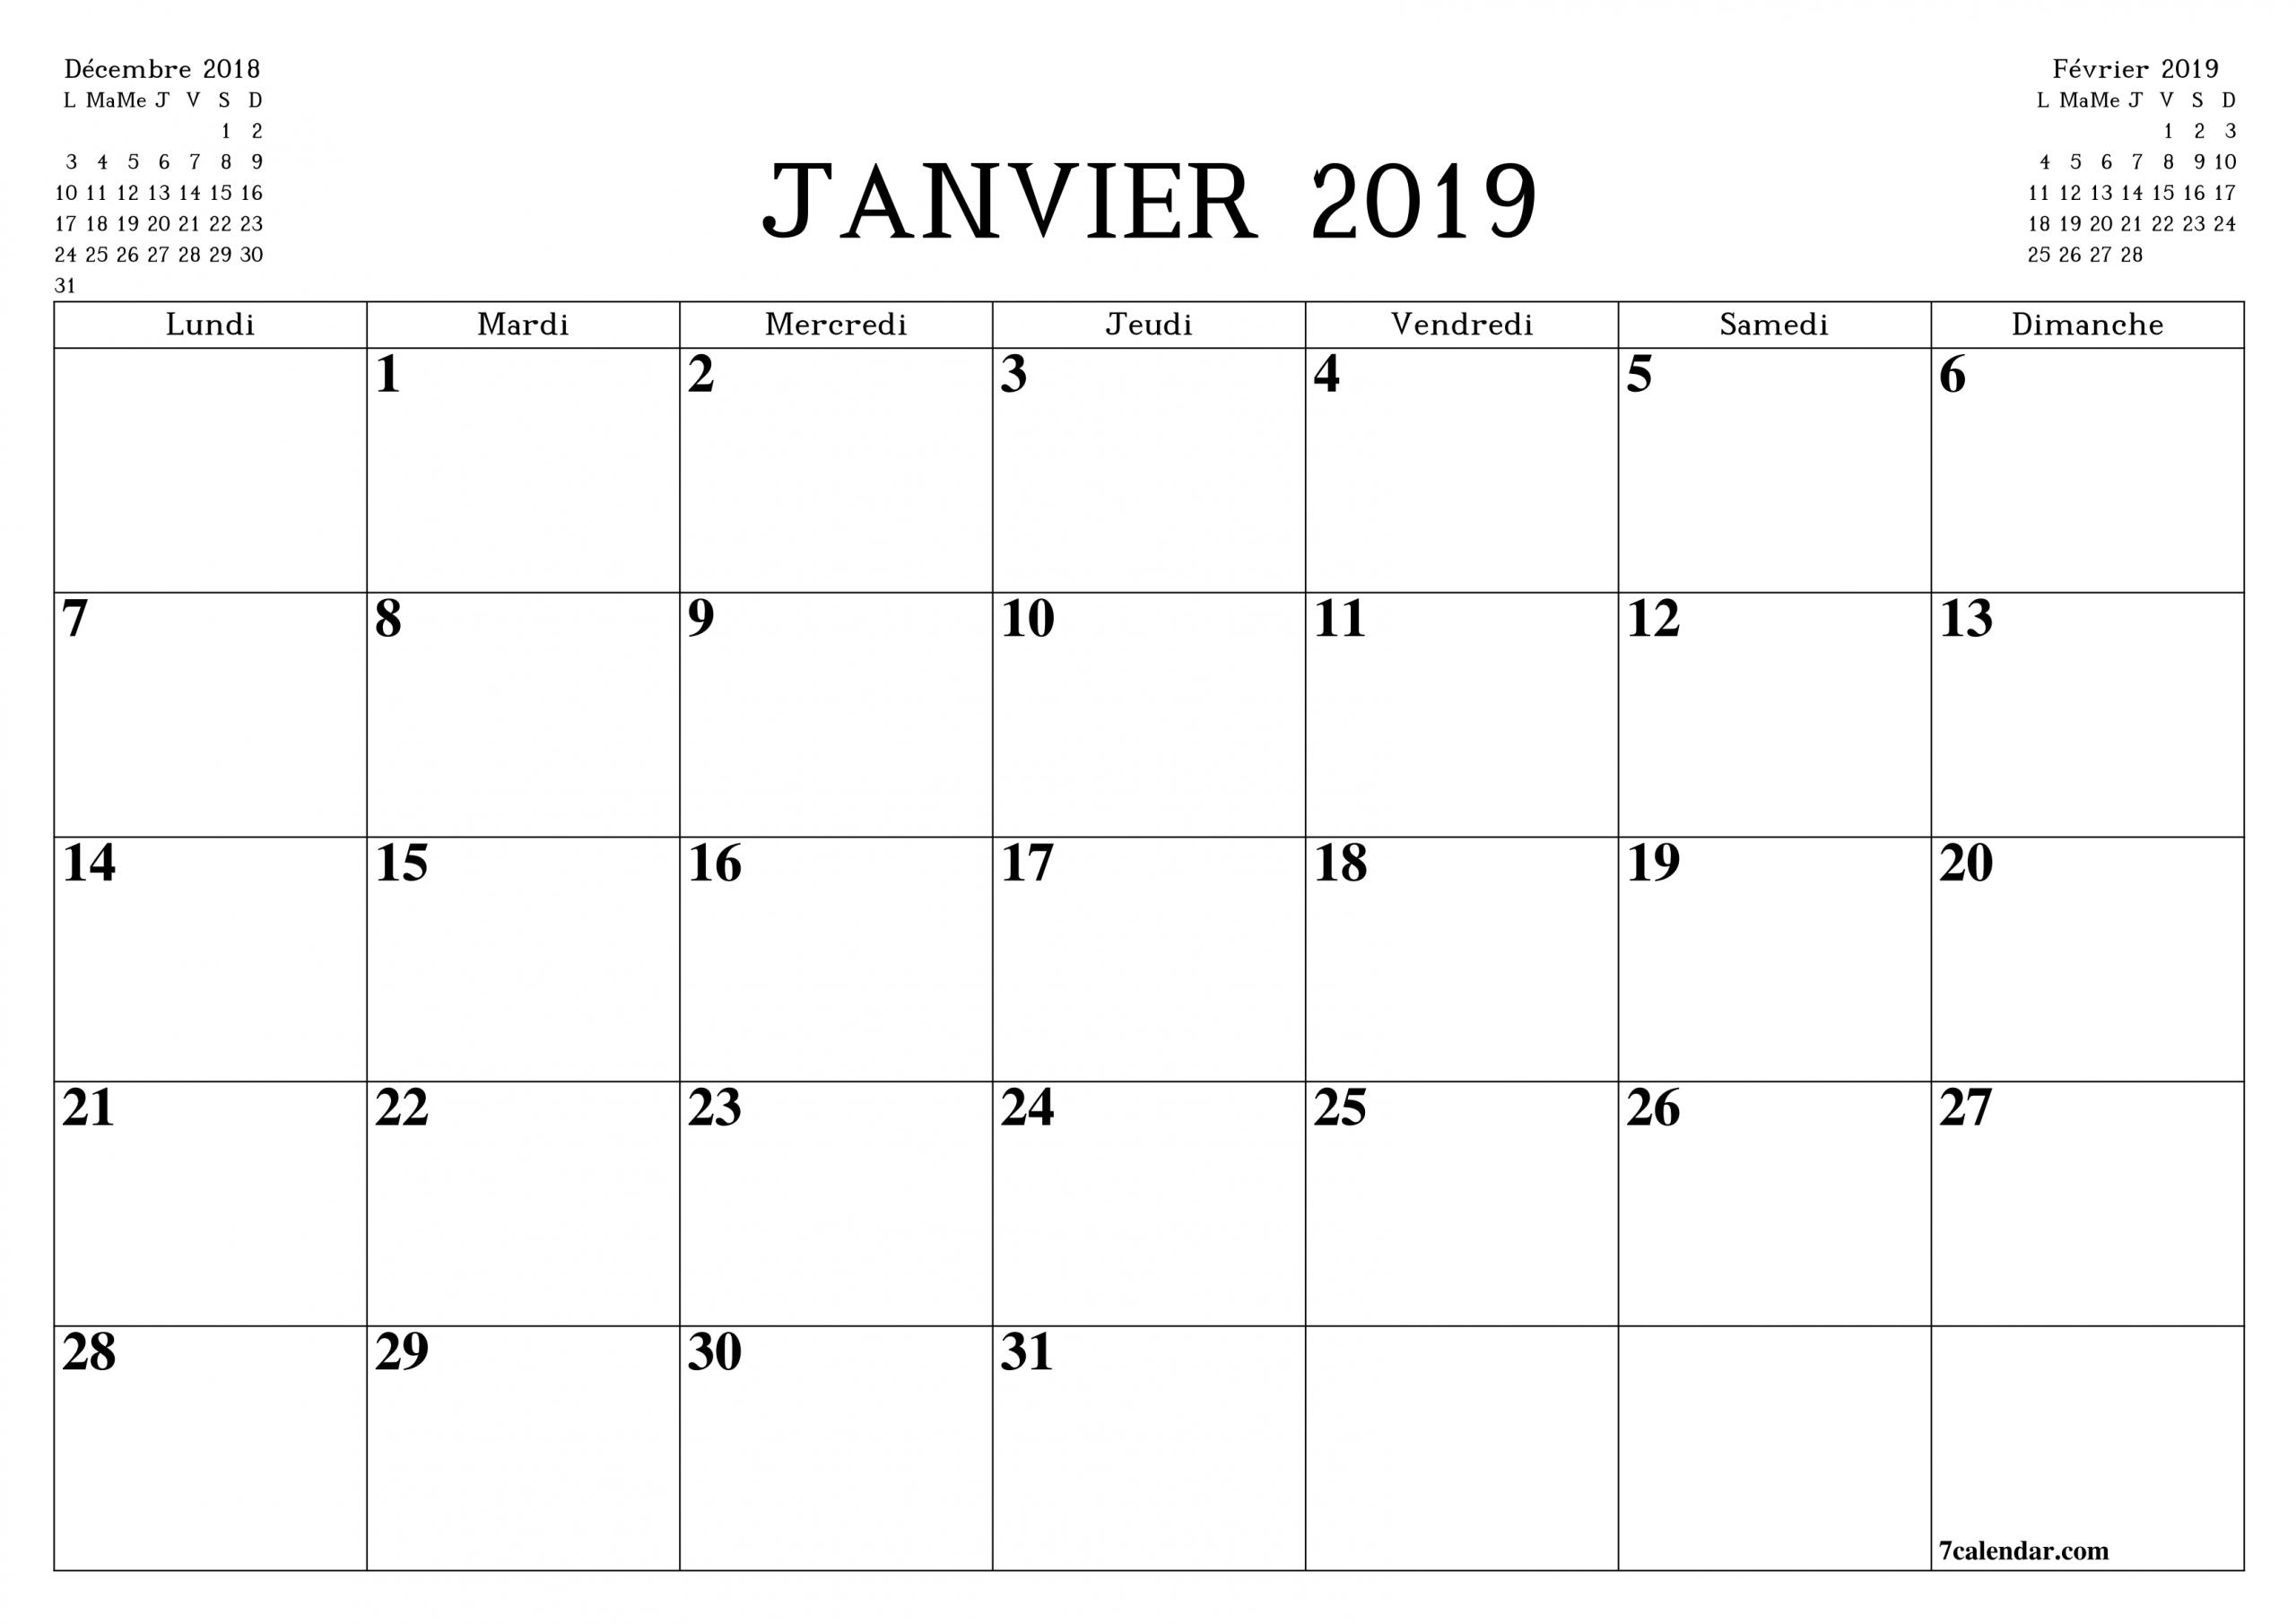 Calendrier Et Calendrier Mensuel Vierge Imprimable Gratuit pour Calendrier Mensuel 2018 À Imprimer